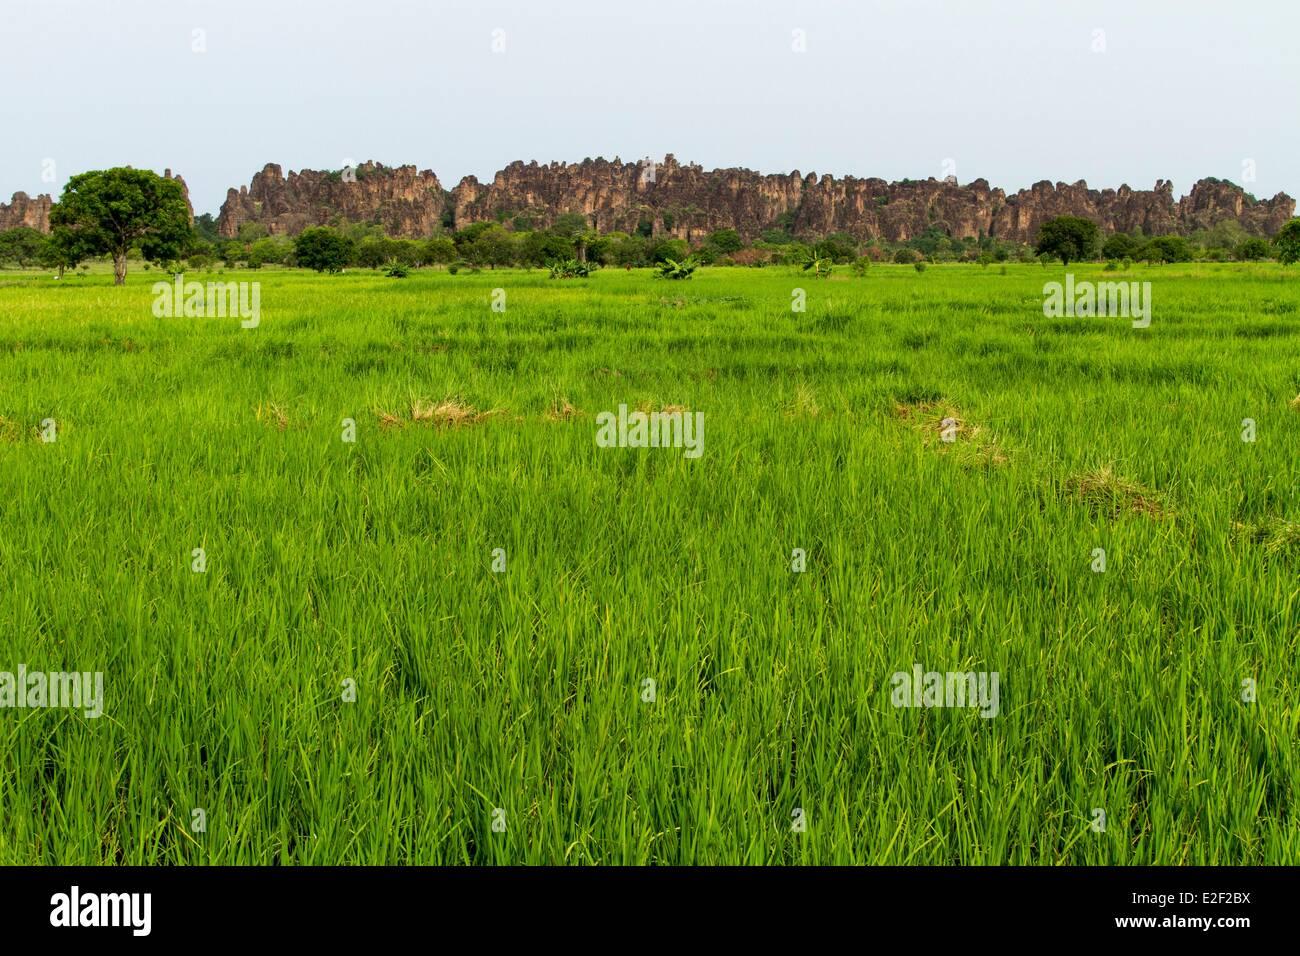 Burkina Faso, Senoufo area, Pics de Sindou - Stock Image